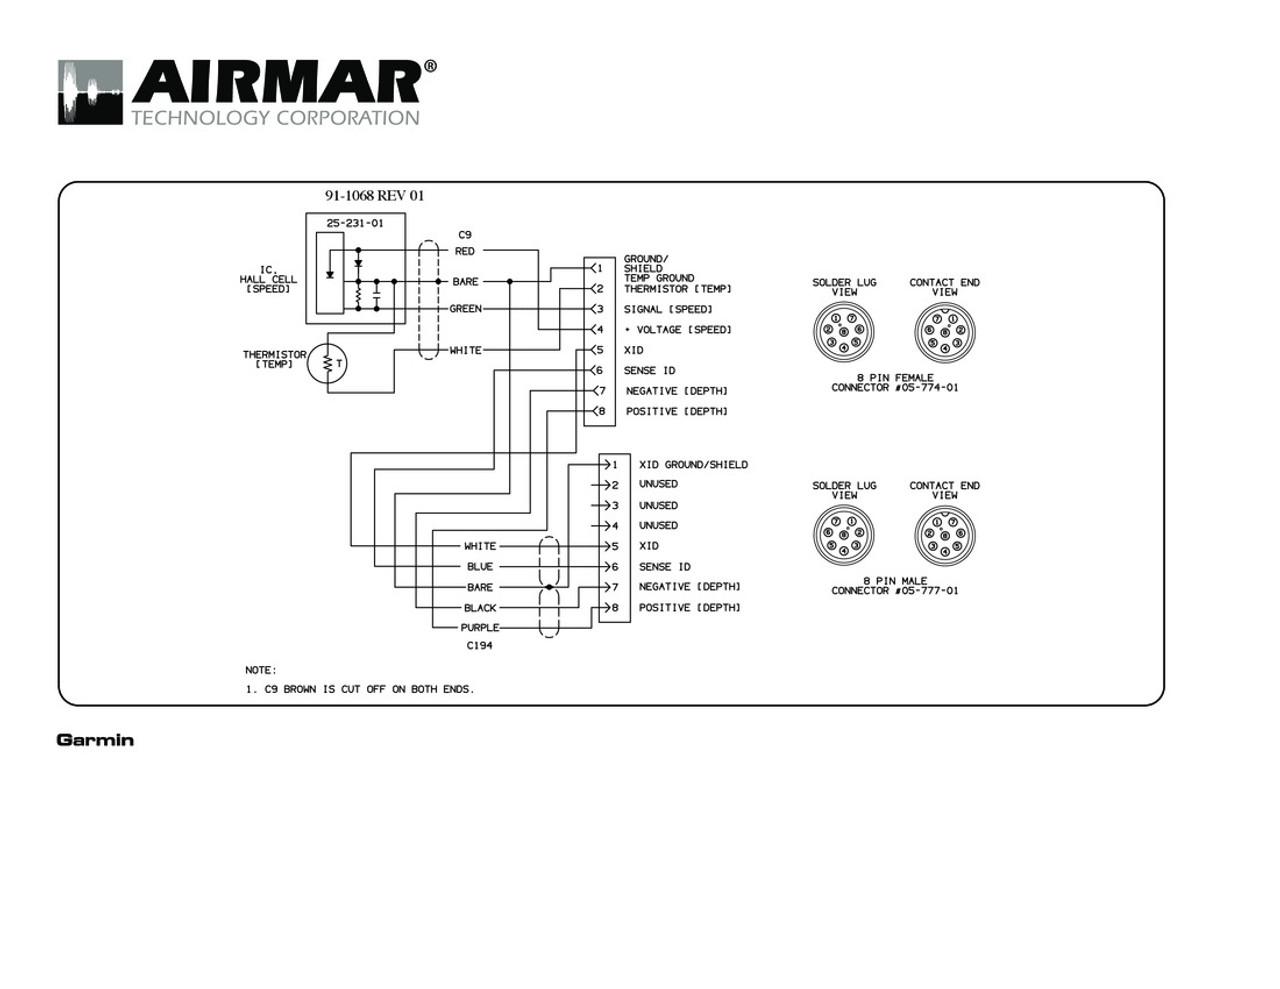 airmar wiring diagram garmin st850 8 pin s t blue bottle marine mirror [ 1100 x 850 Pixel ]